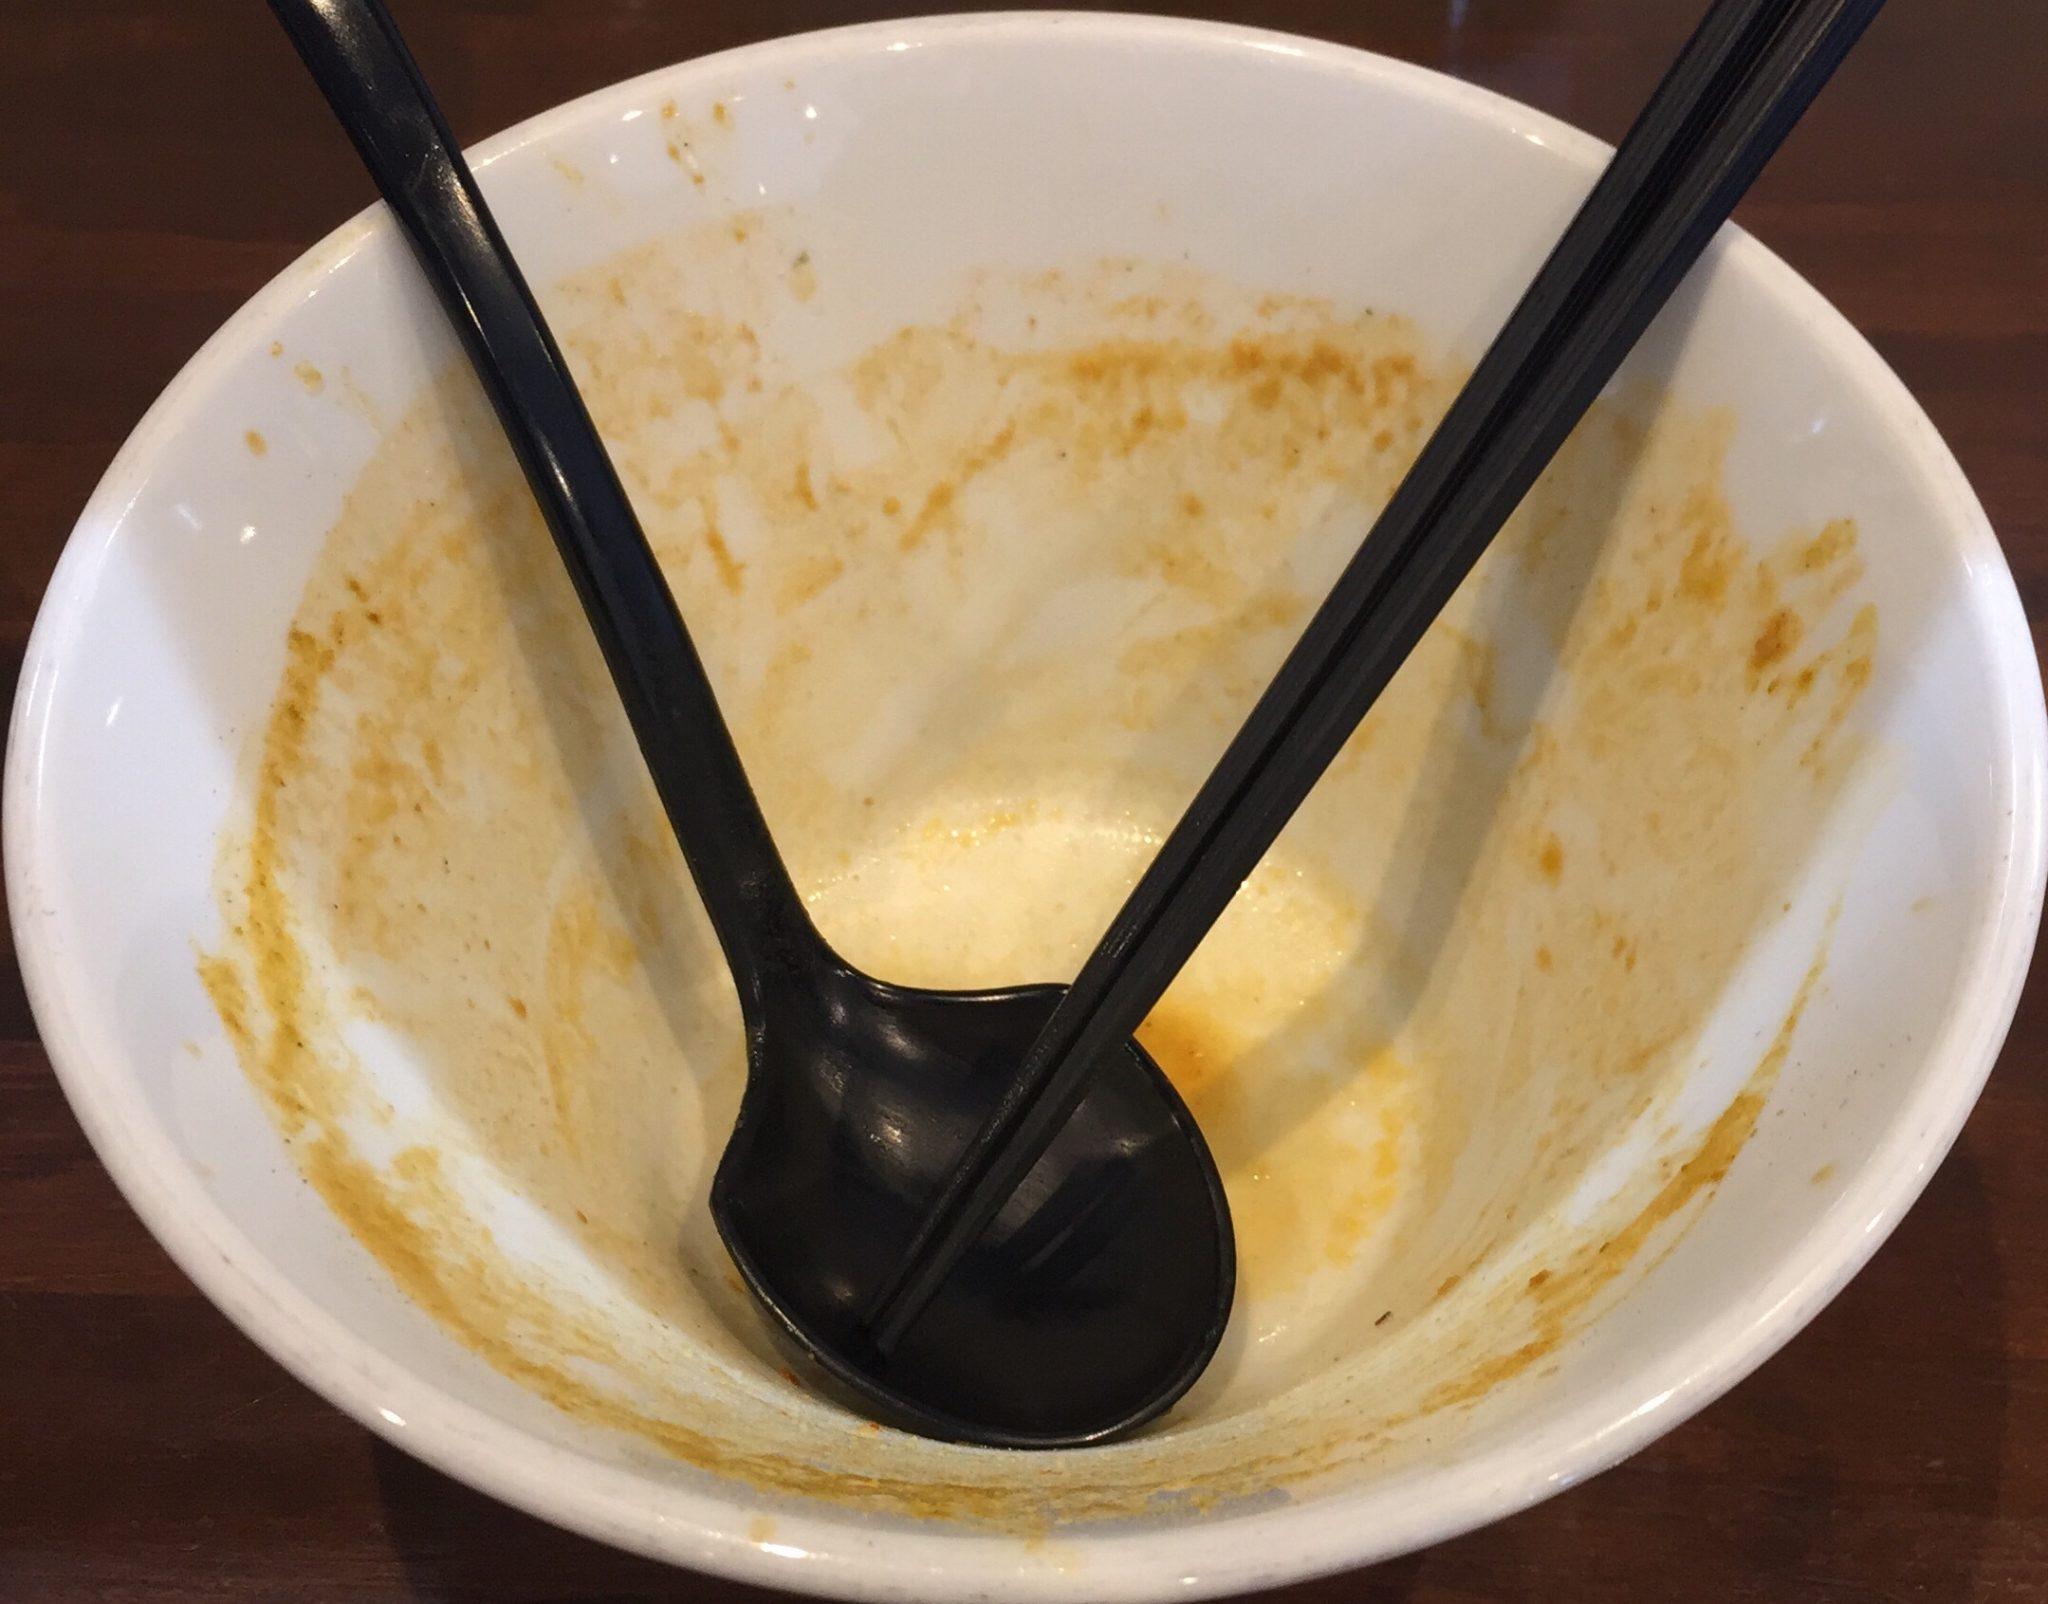 NOODLE SHOP KOUMITEI(香味亭) オマール海老香る濃厚ラーメン 濃厚味噌カレーヌードル 完食